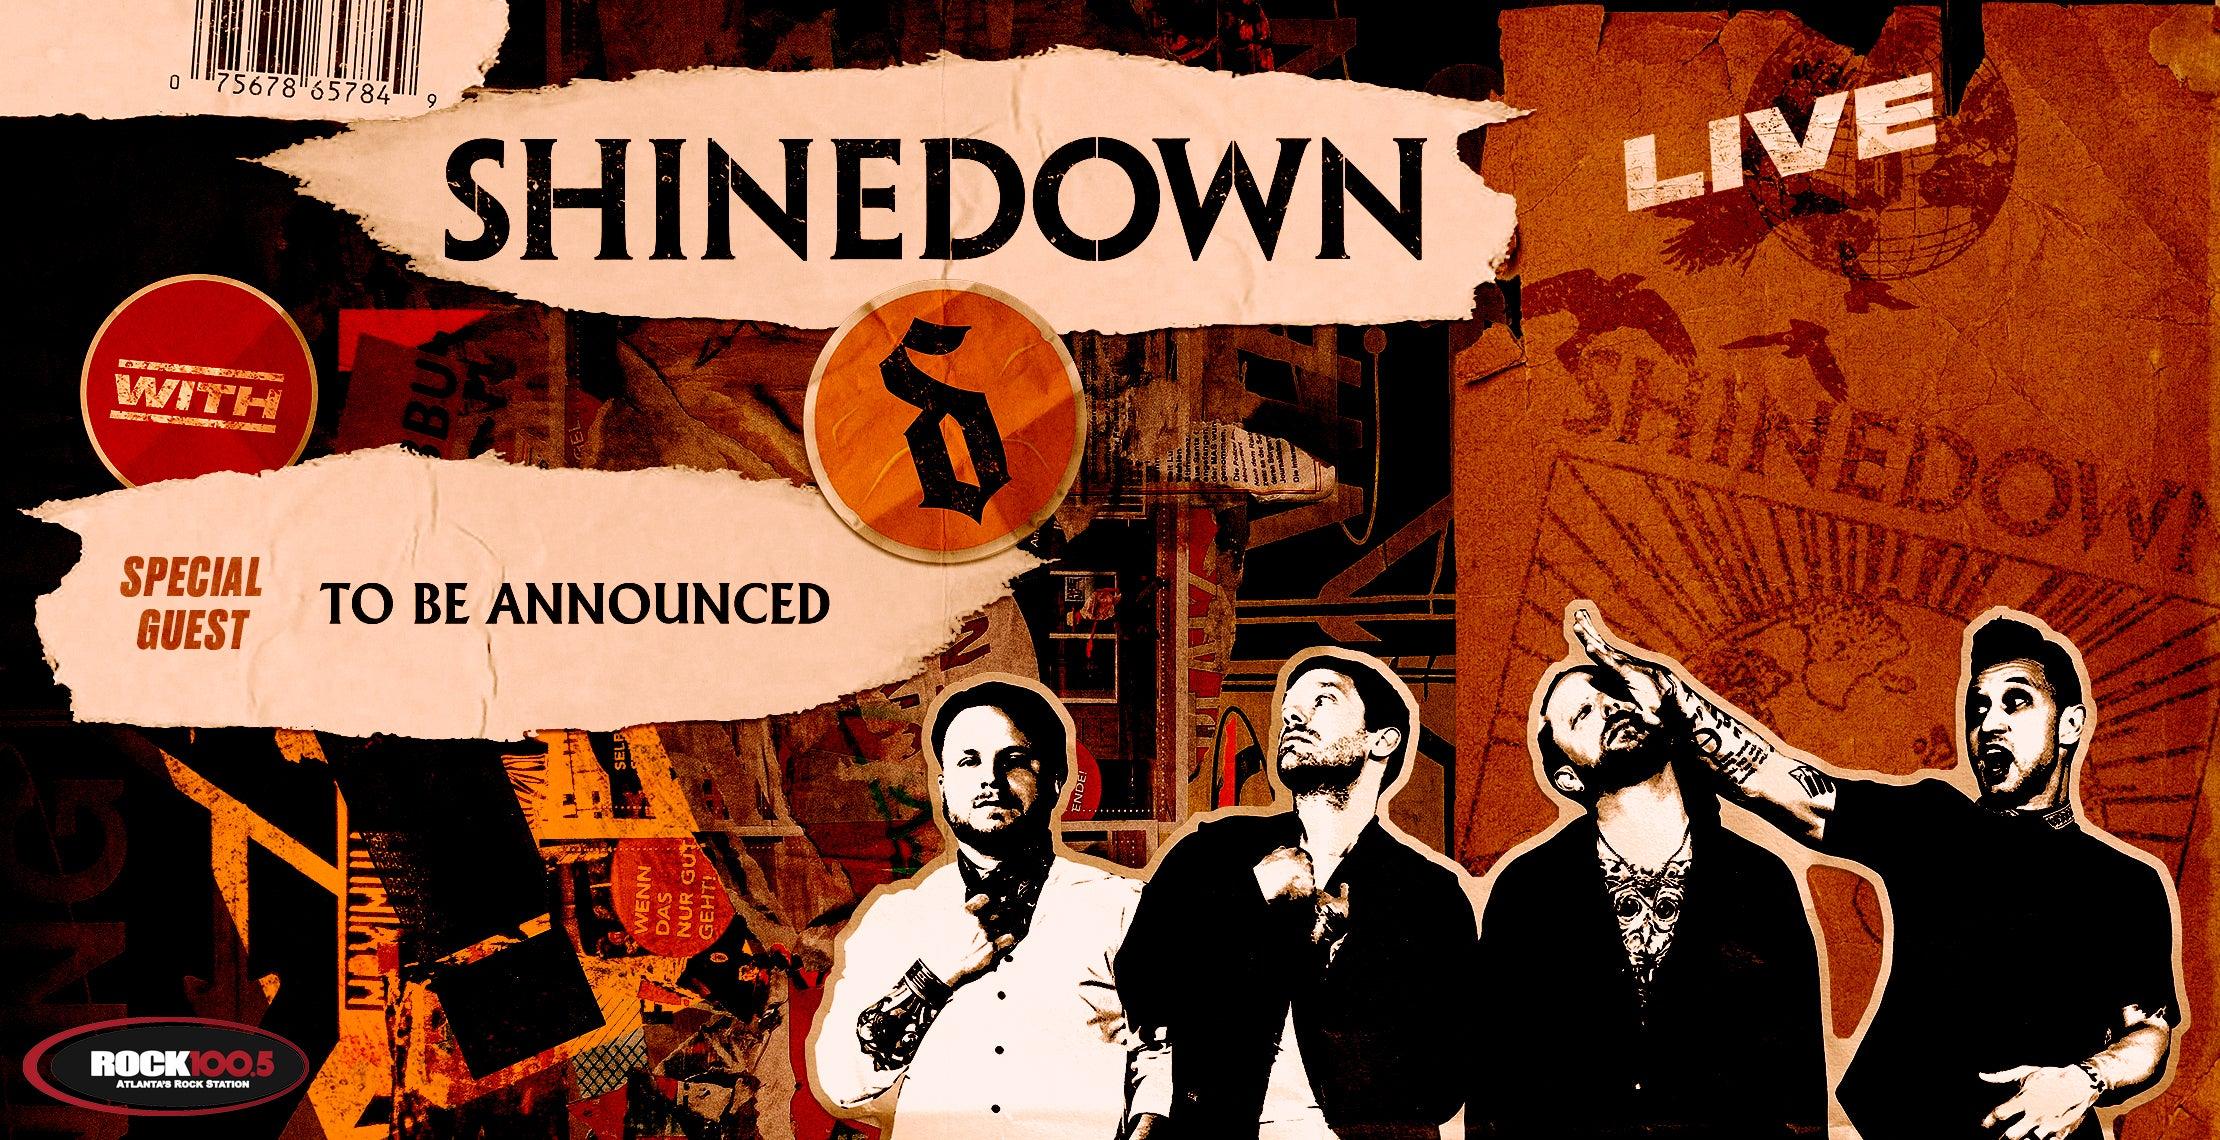 Rock 100.5 Presents Shinedown